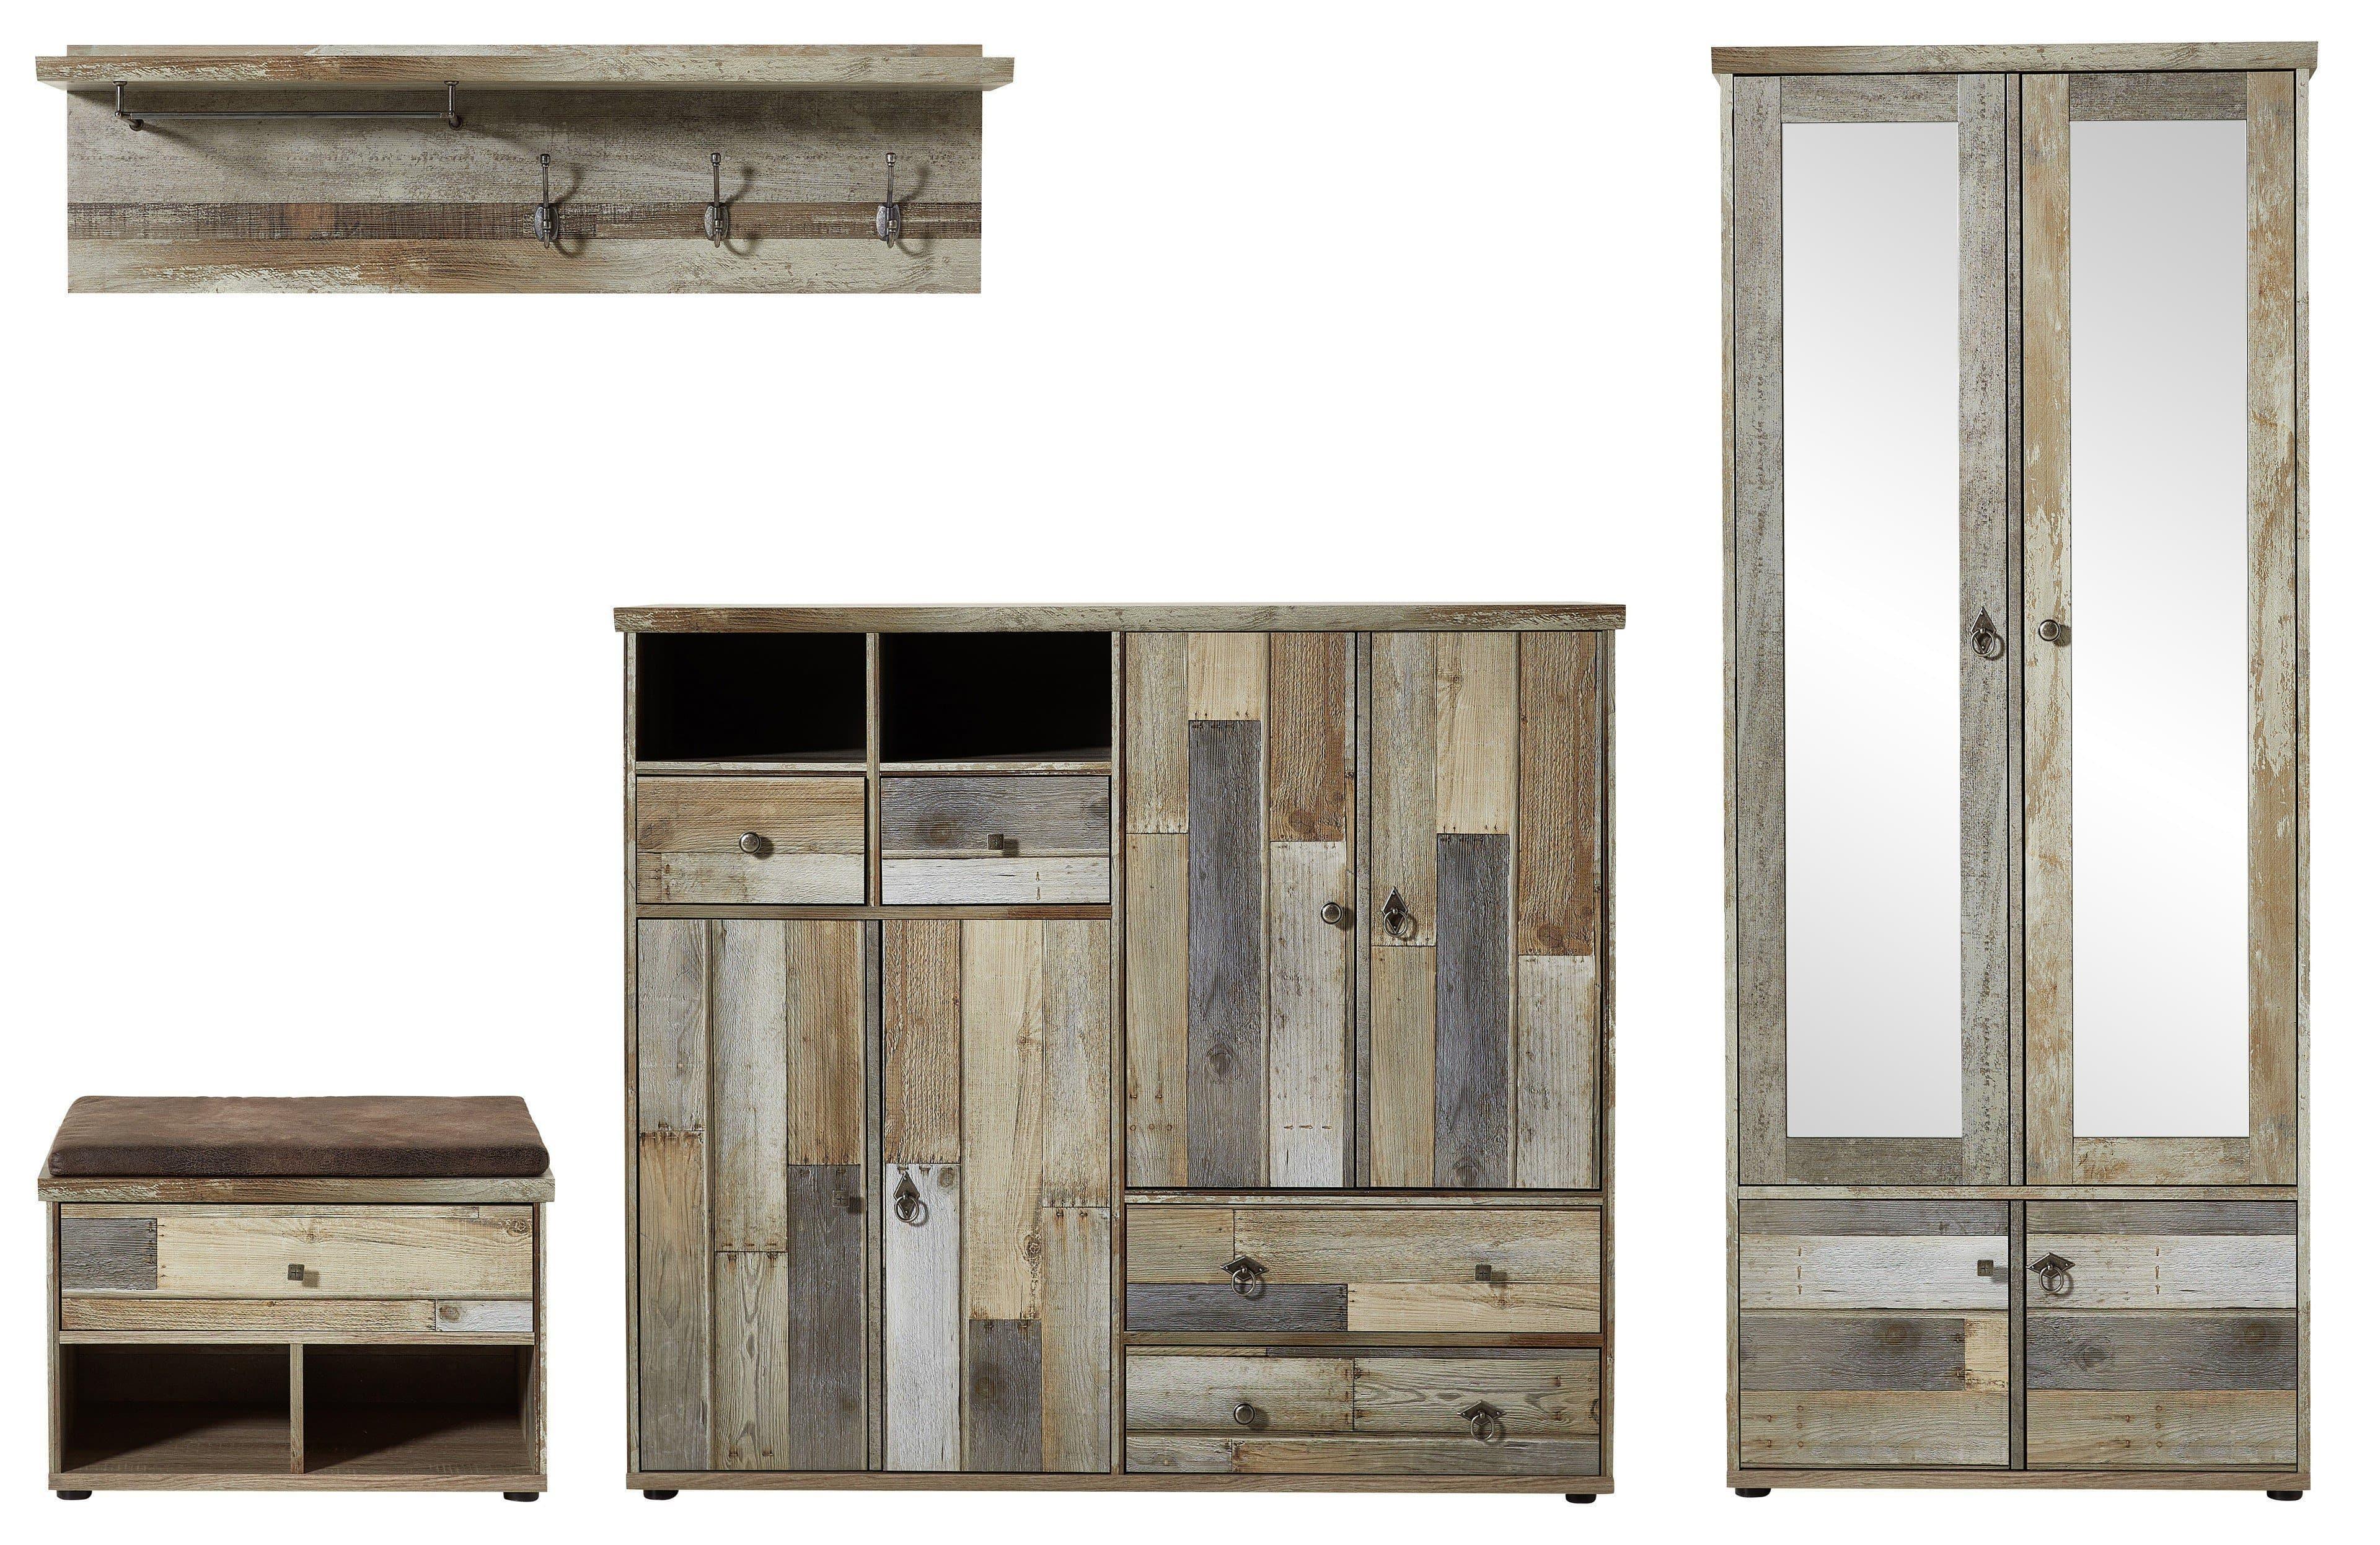 Set de mobila hol din pal, 4 piese Bazna II Natur / Gri inchis somproduct.ro